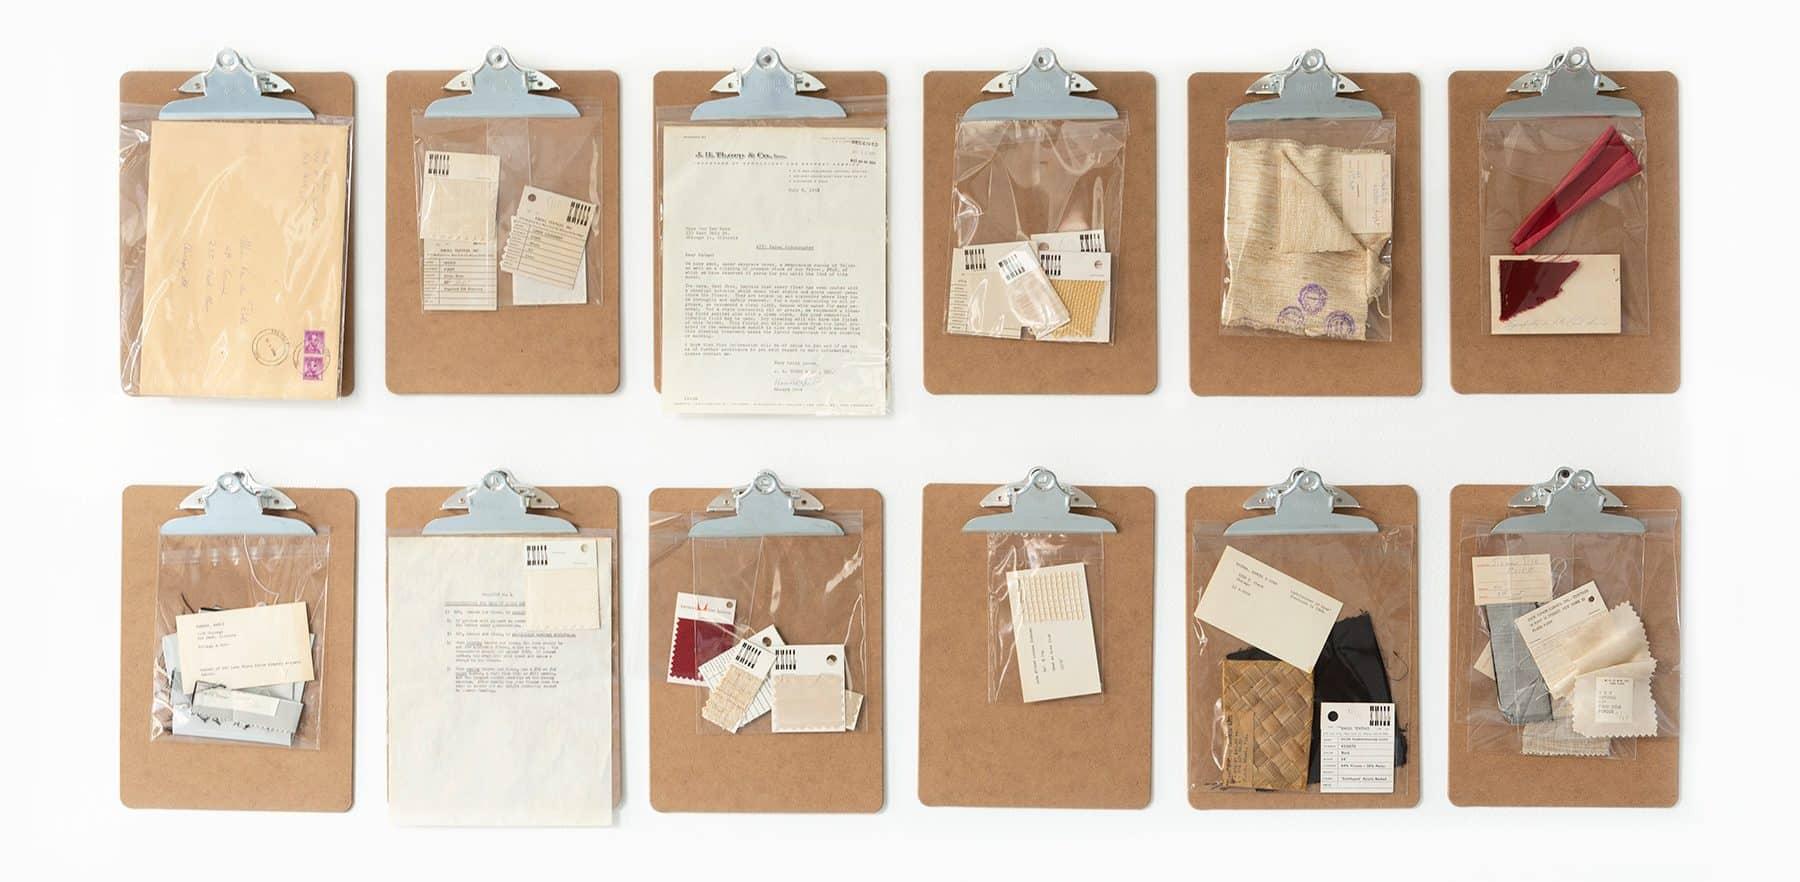 Mies van der Rohe Matthew Rachman Gallery Chicago Blues and Beyond blueprints clipboards studio correspondence and ephemera